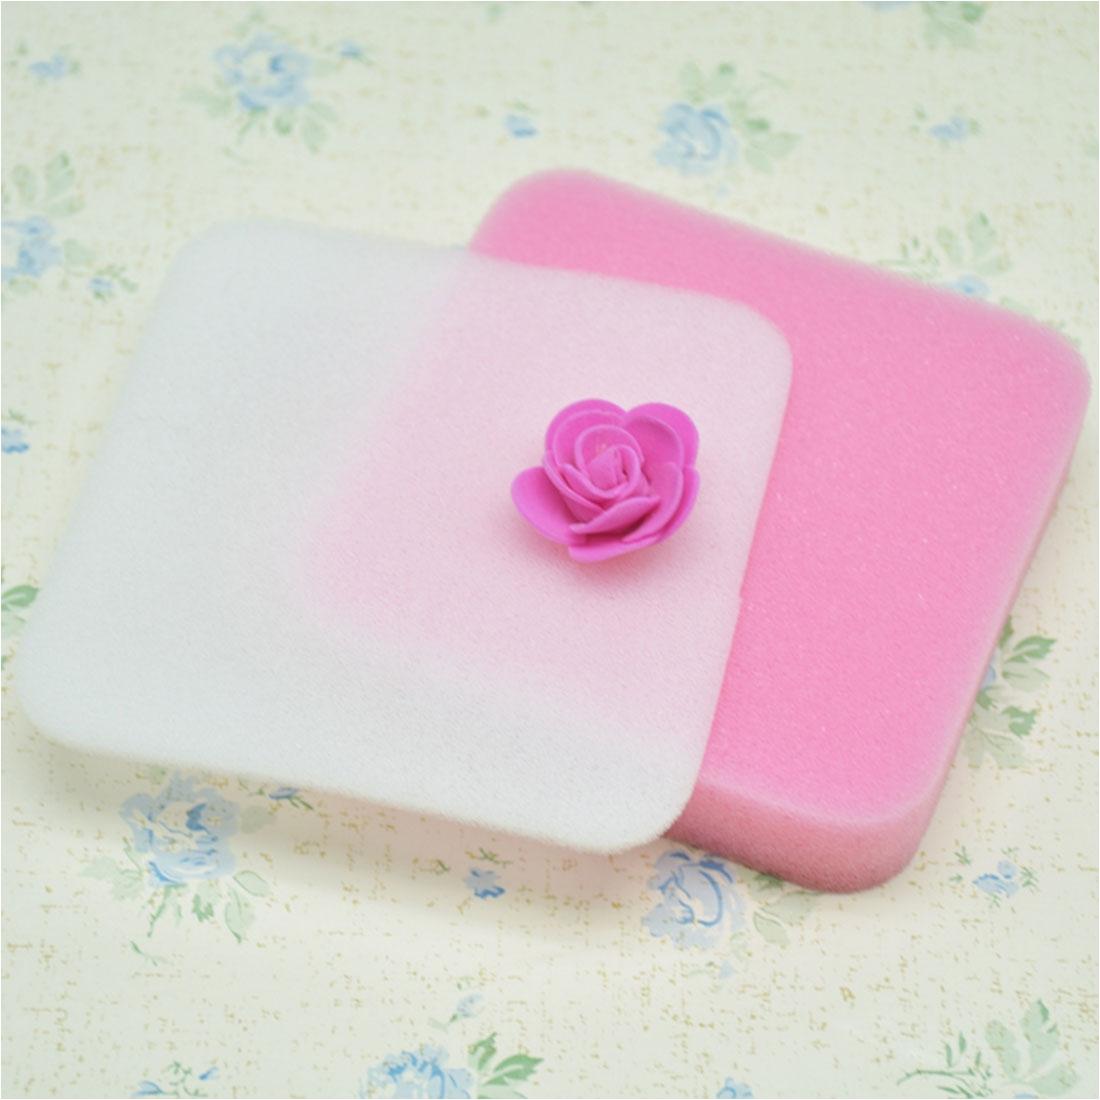 Foam Pads for Flower Making 2pcs Fondant Flower Shapes Mat Shaping Foam Pad Sponge Gum Paste